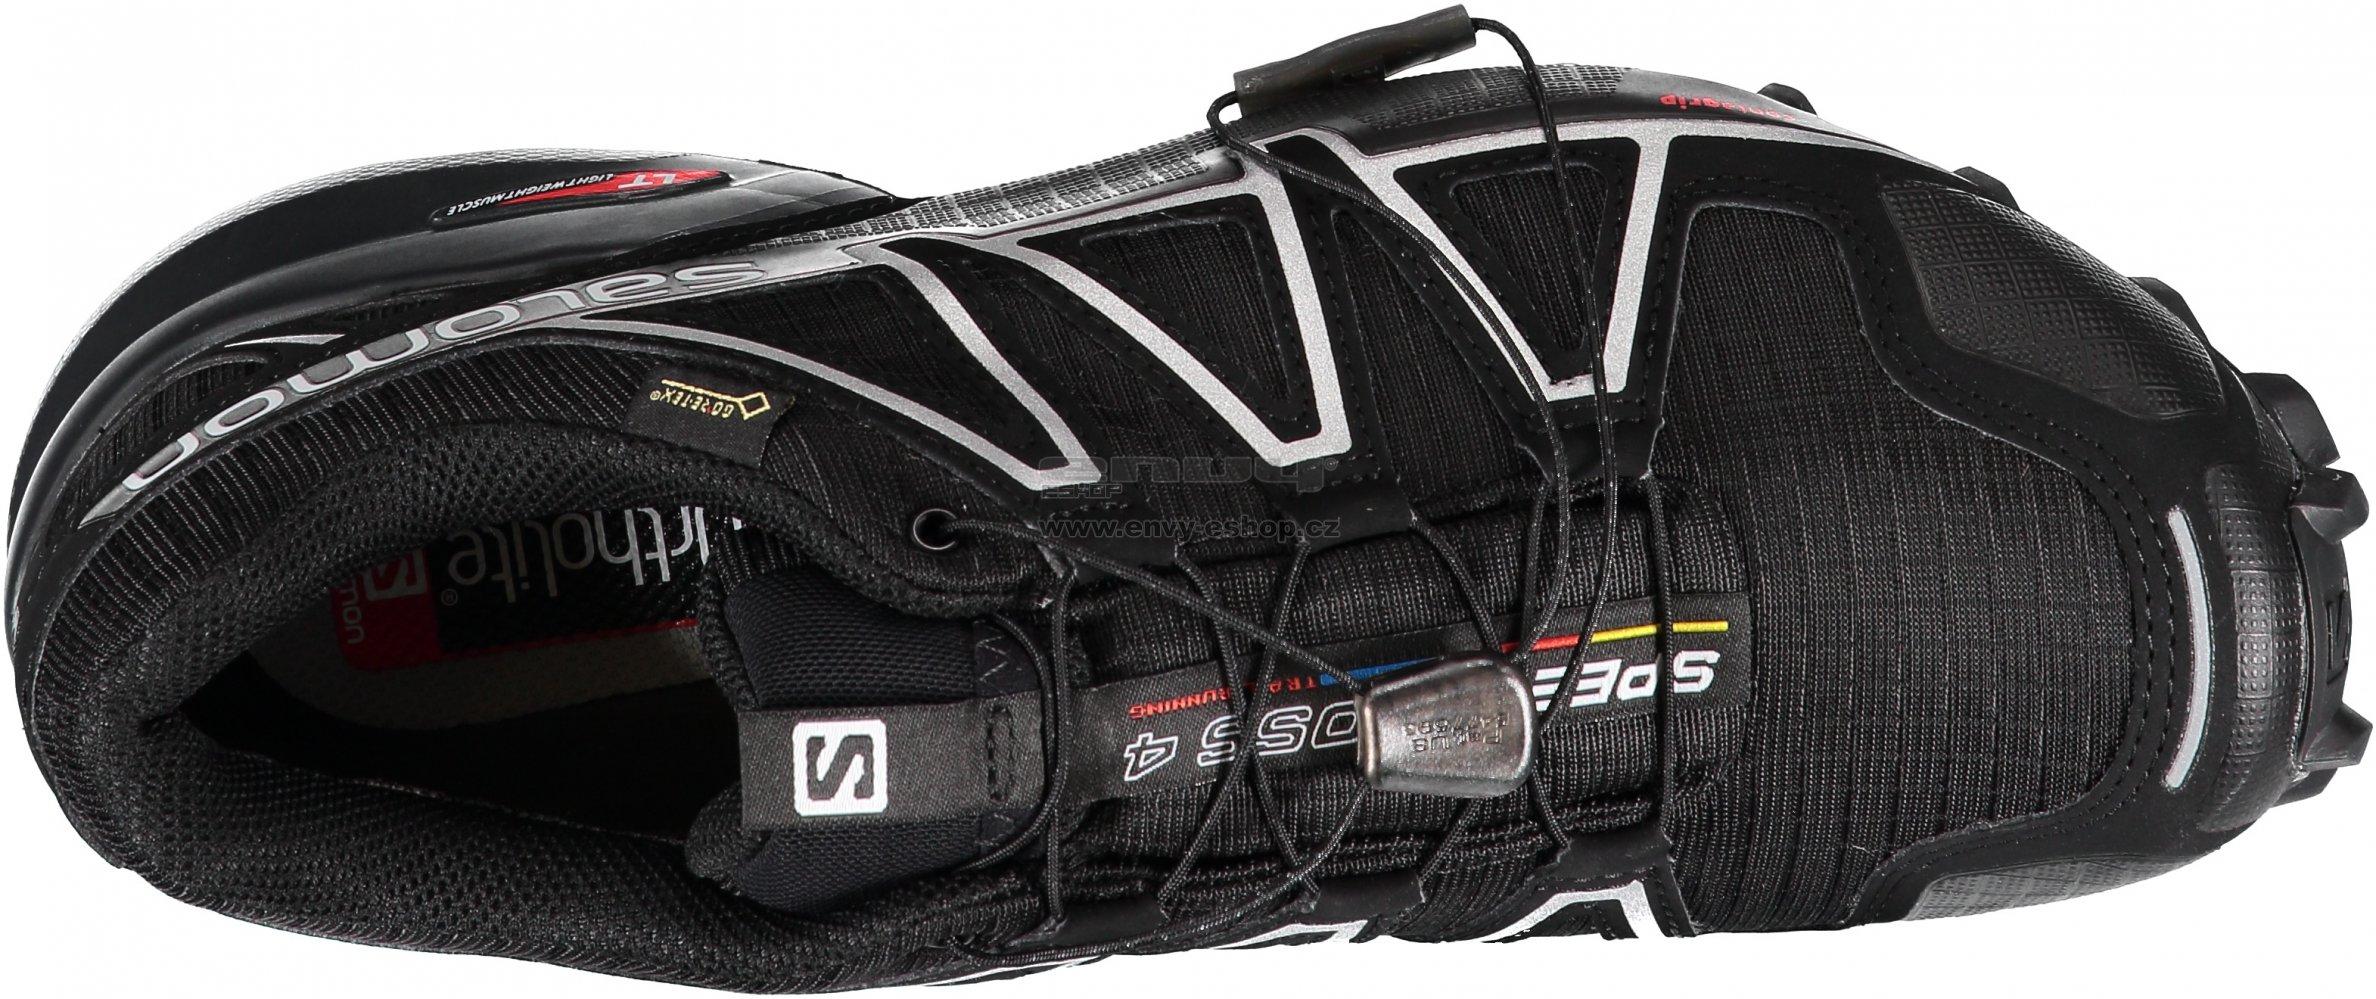 Pánské běžecké boty Salomon Speedcross 4 GTX Black black si velikost ... 48323edaf9